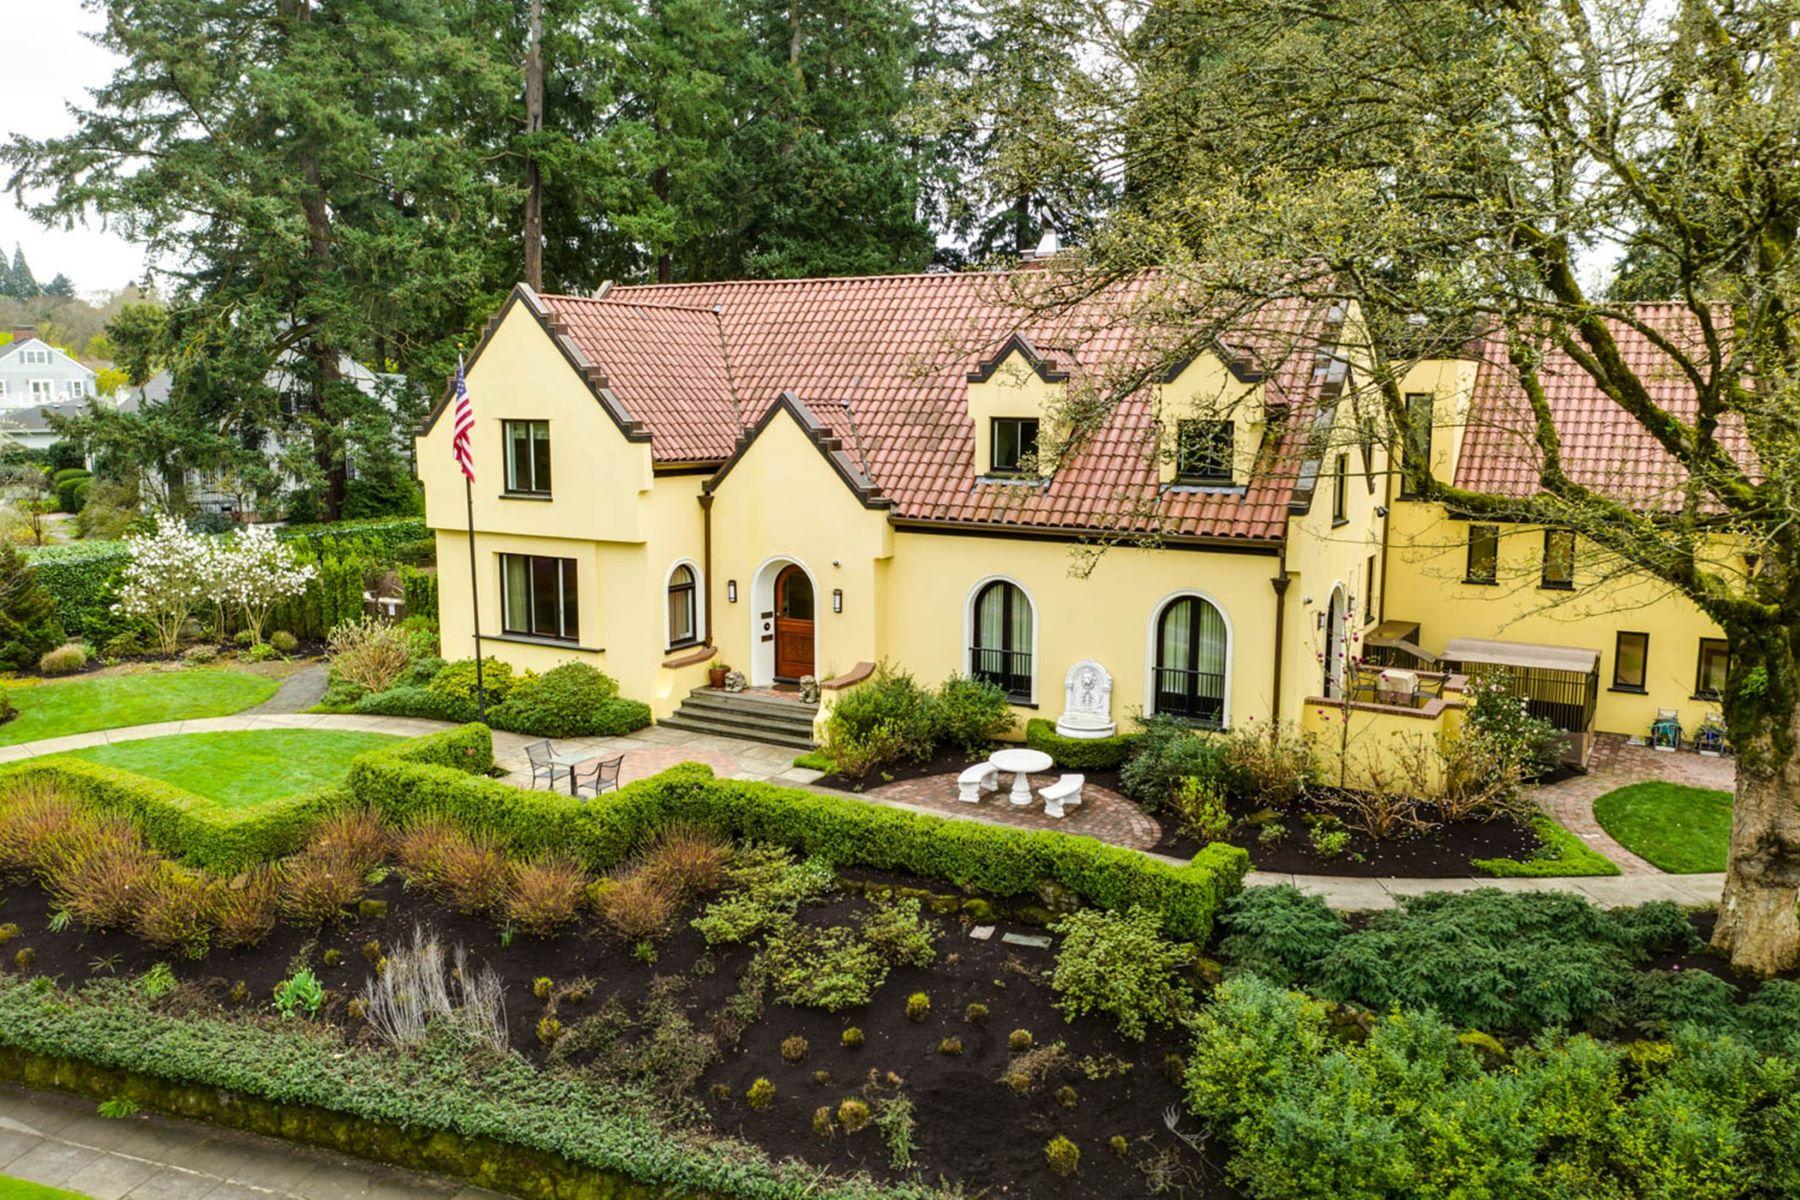 Single Family Homes for Active at 2928 SE WOODSTOCK BLVD Portland, Oregon 97202 United States